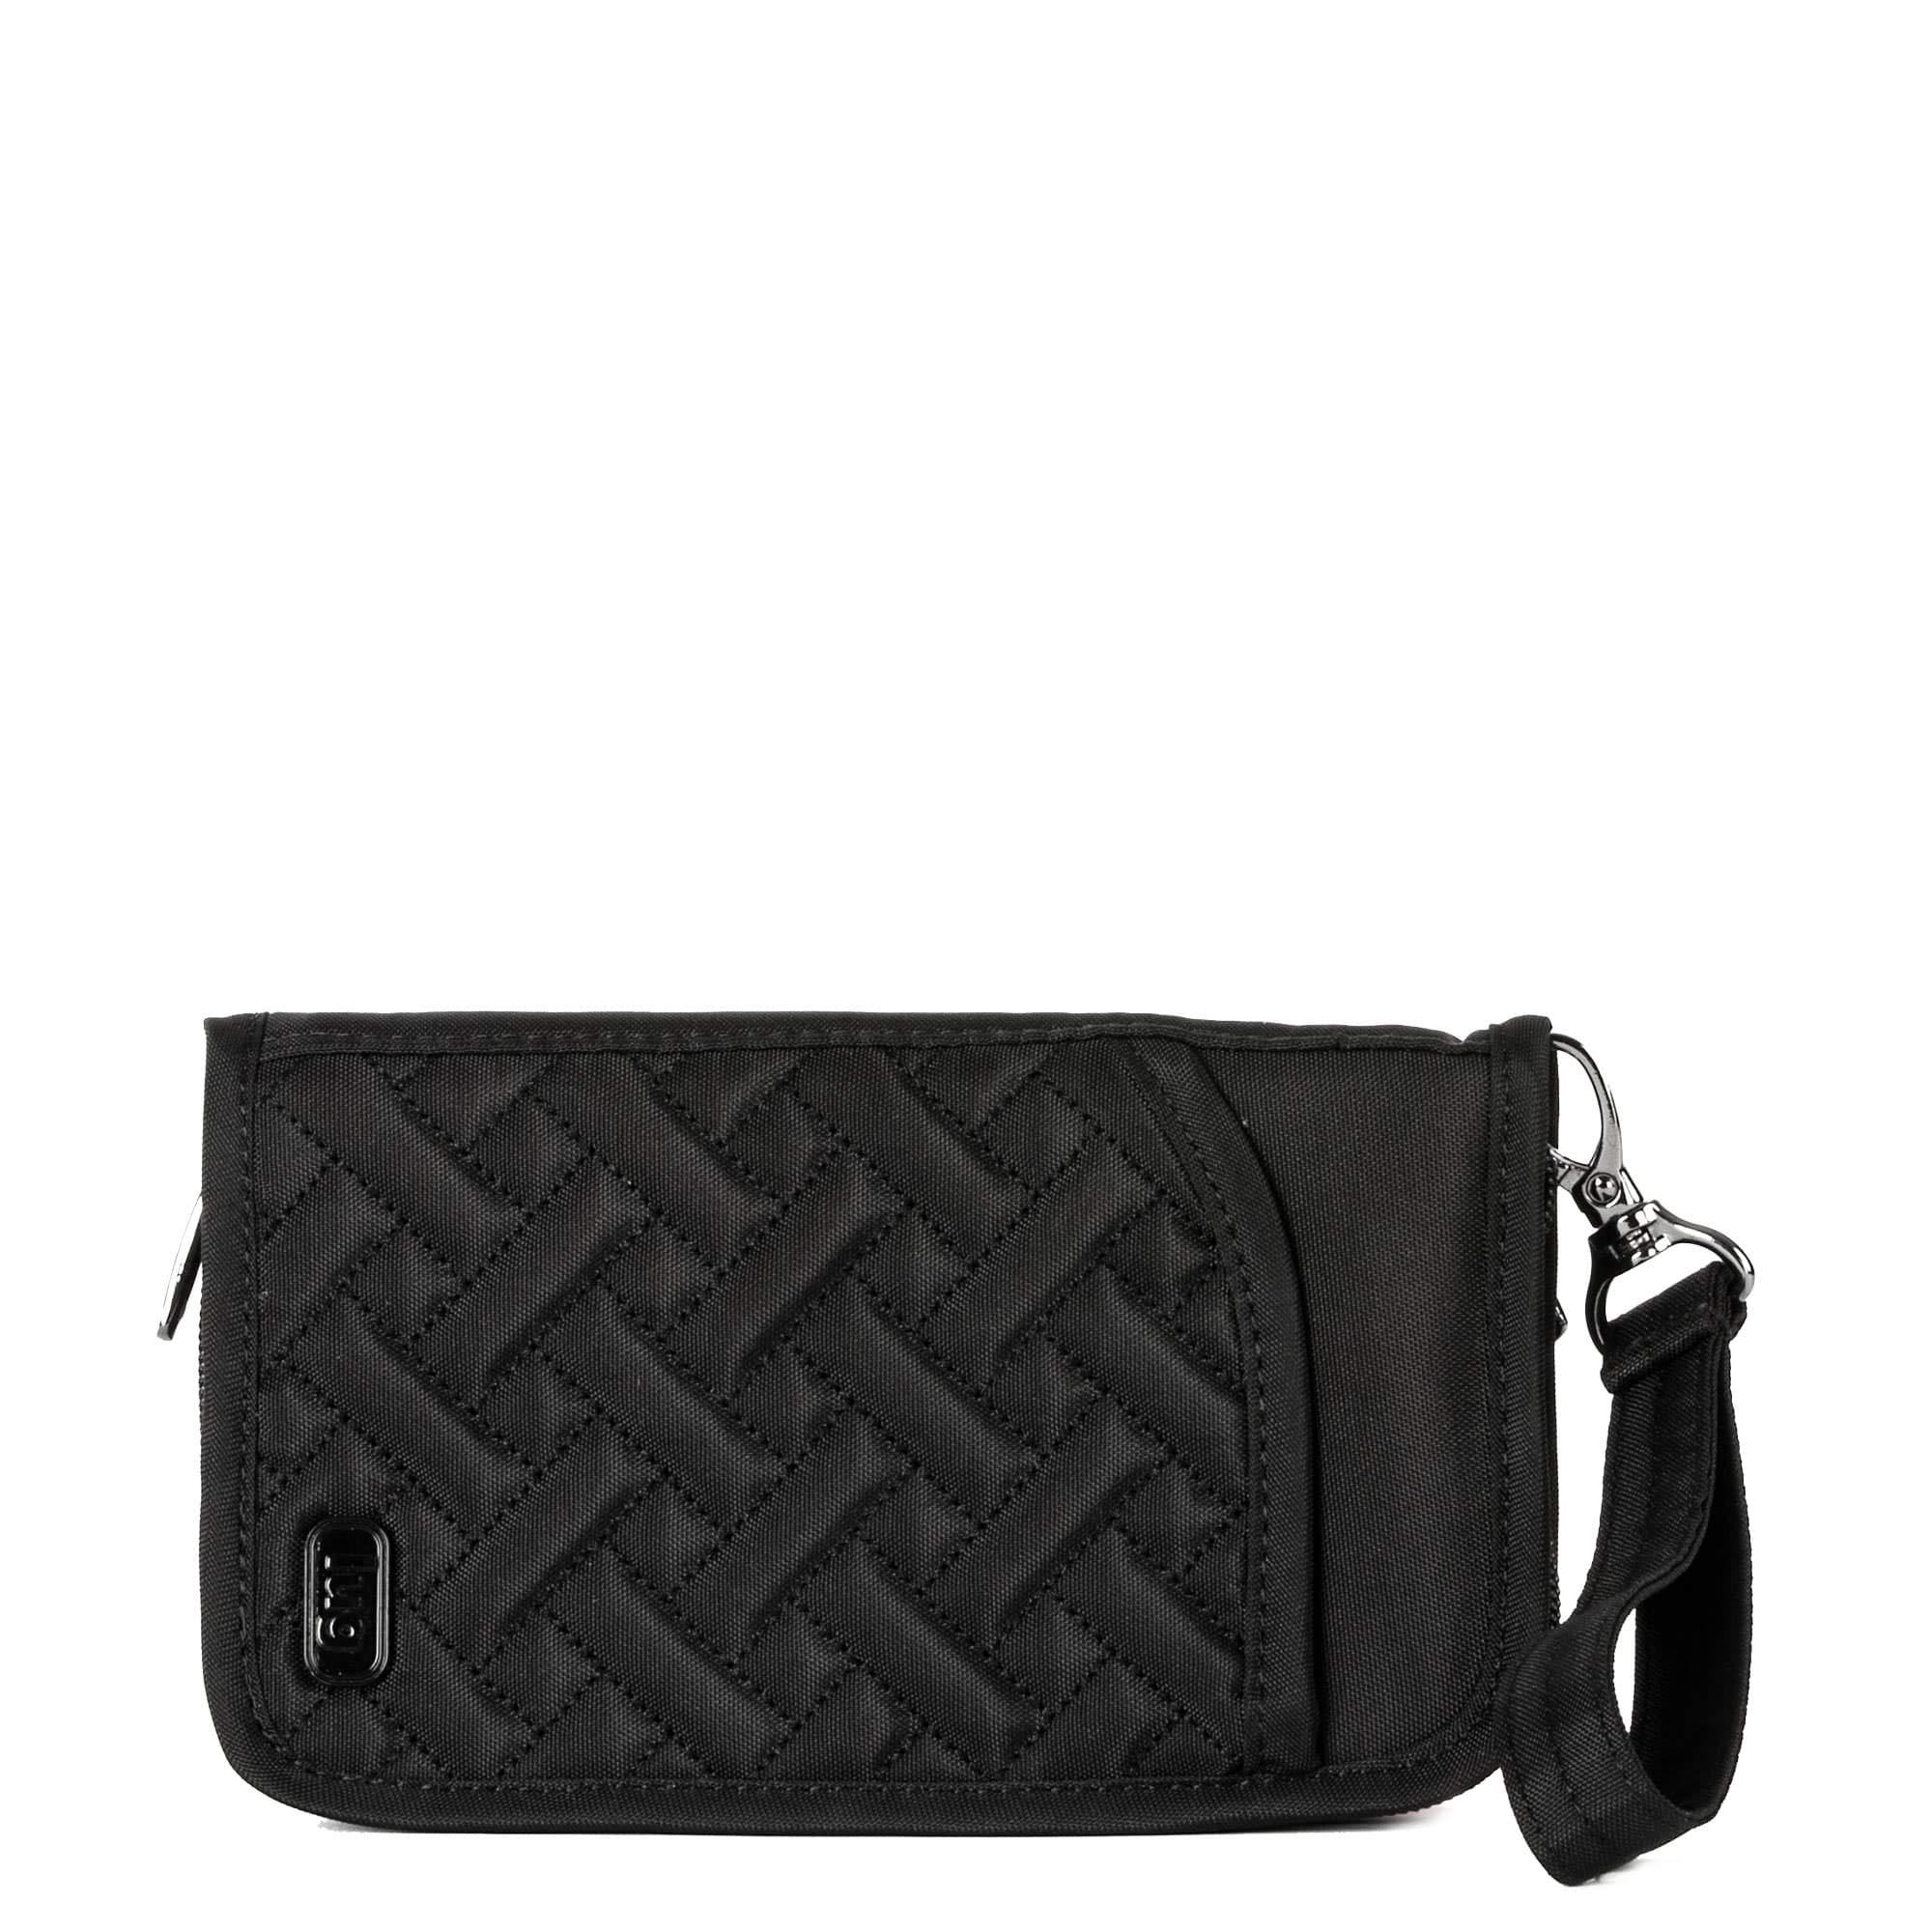 Lug Women's Tandem Zip Passport Wallet, Brushed Black